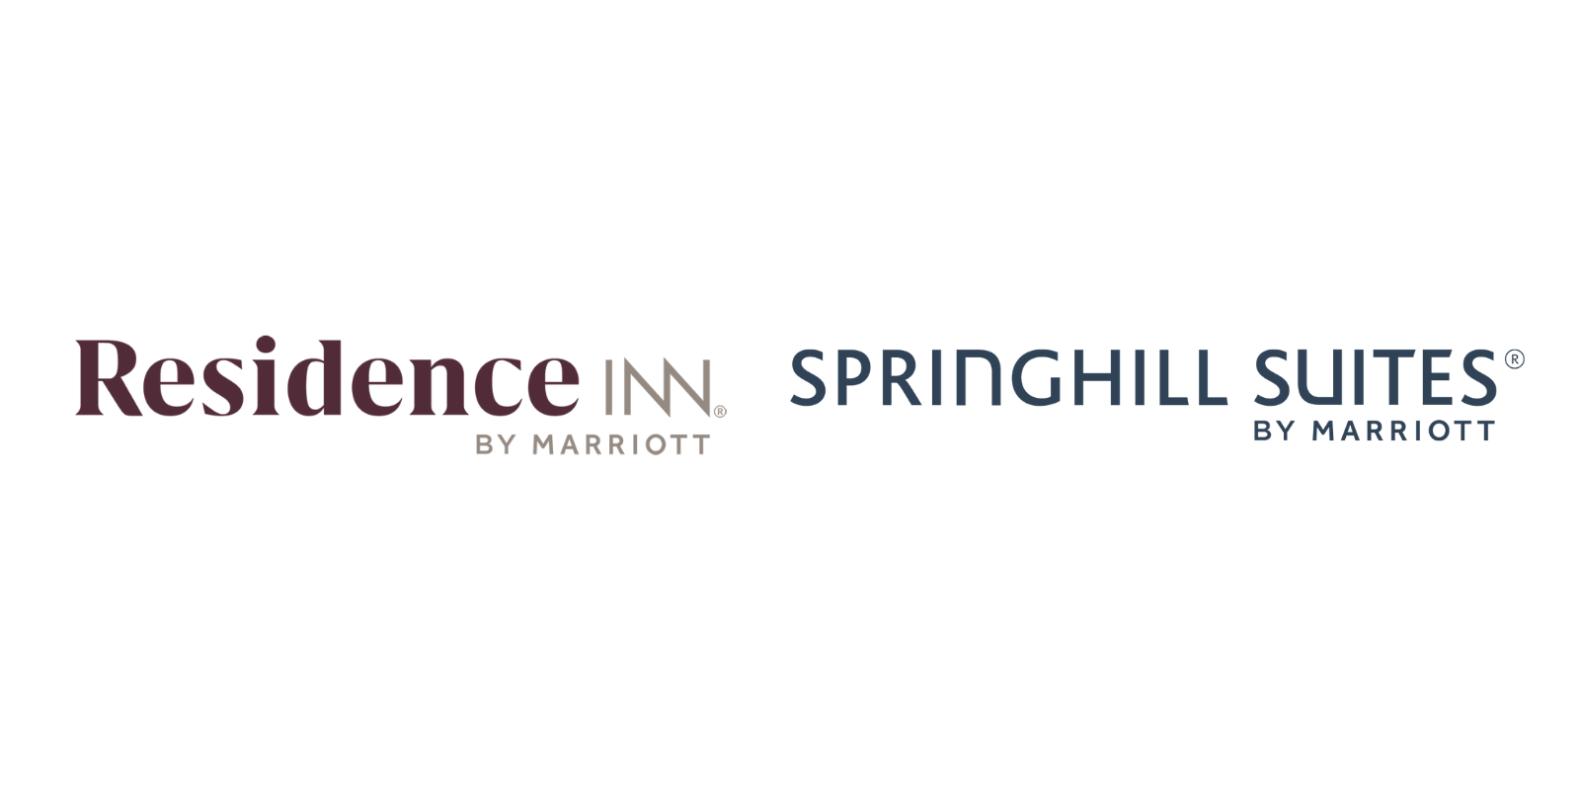 Residence Inn & SpringHill Suites LIC (Opening 2022)